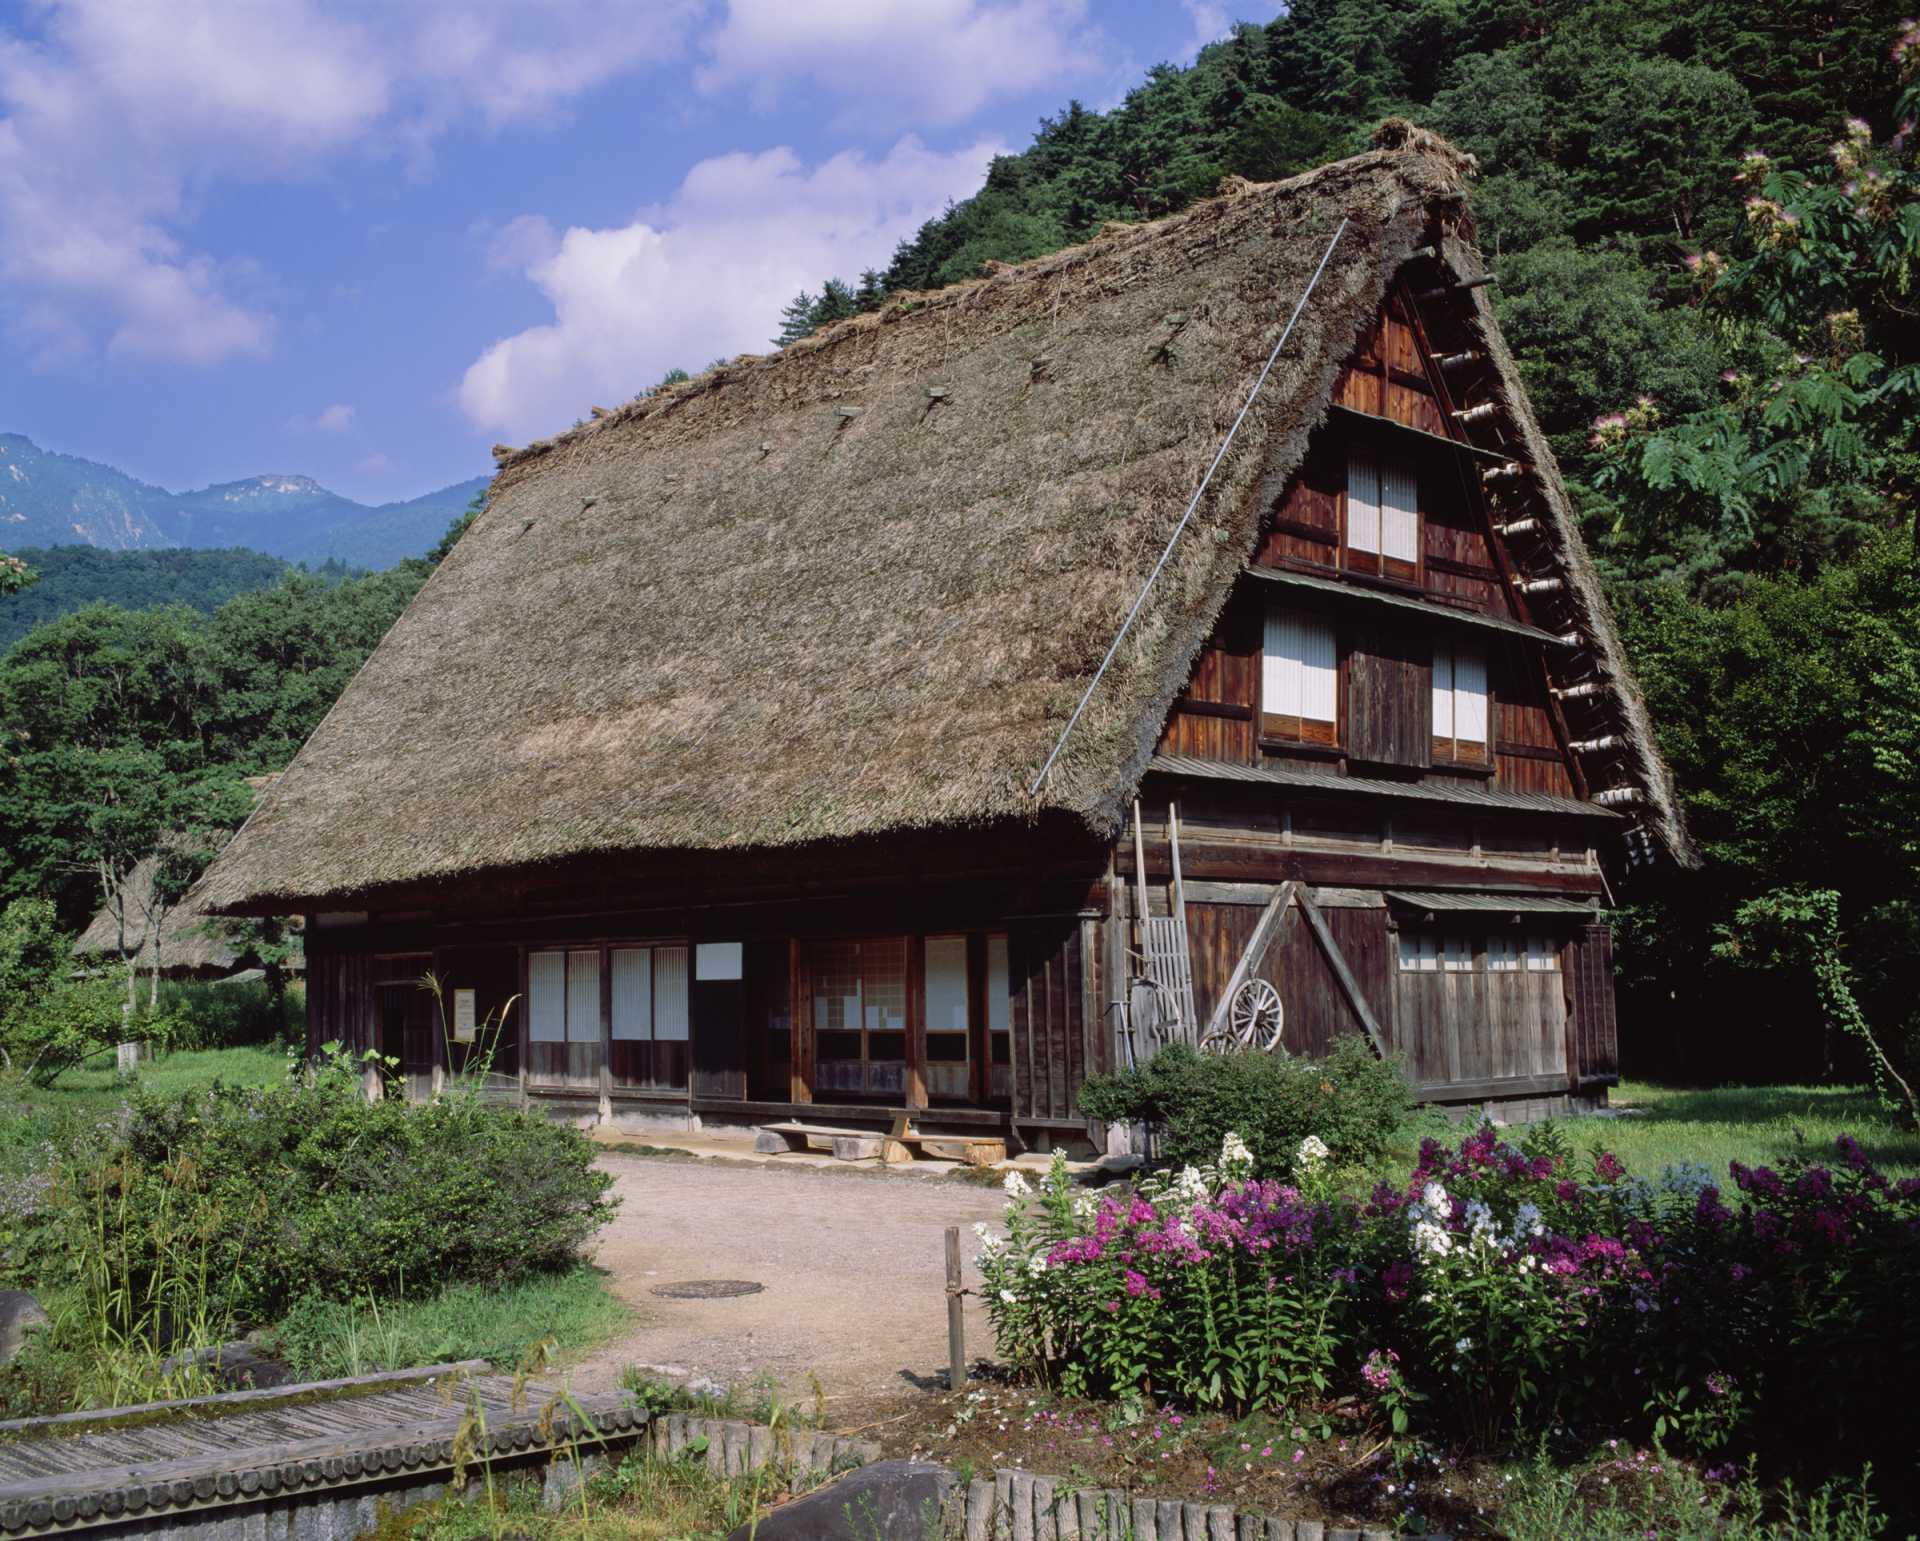 Shirakawa-go (Historic Village), World Cultural Heritage, Group of Traditional Buildings, Greenery